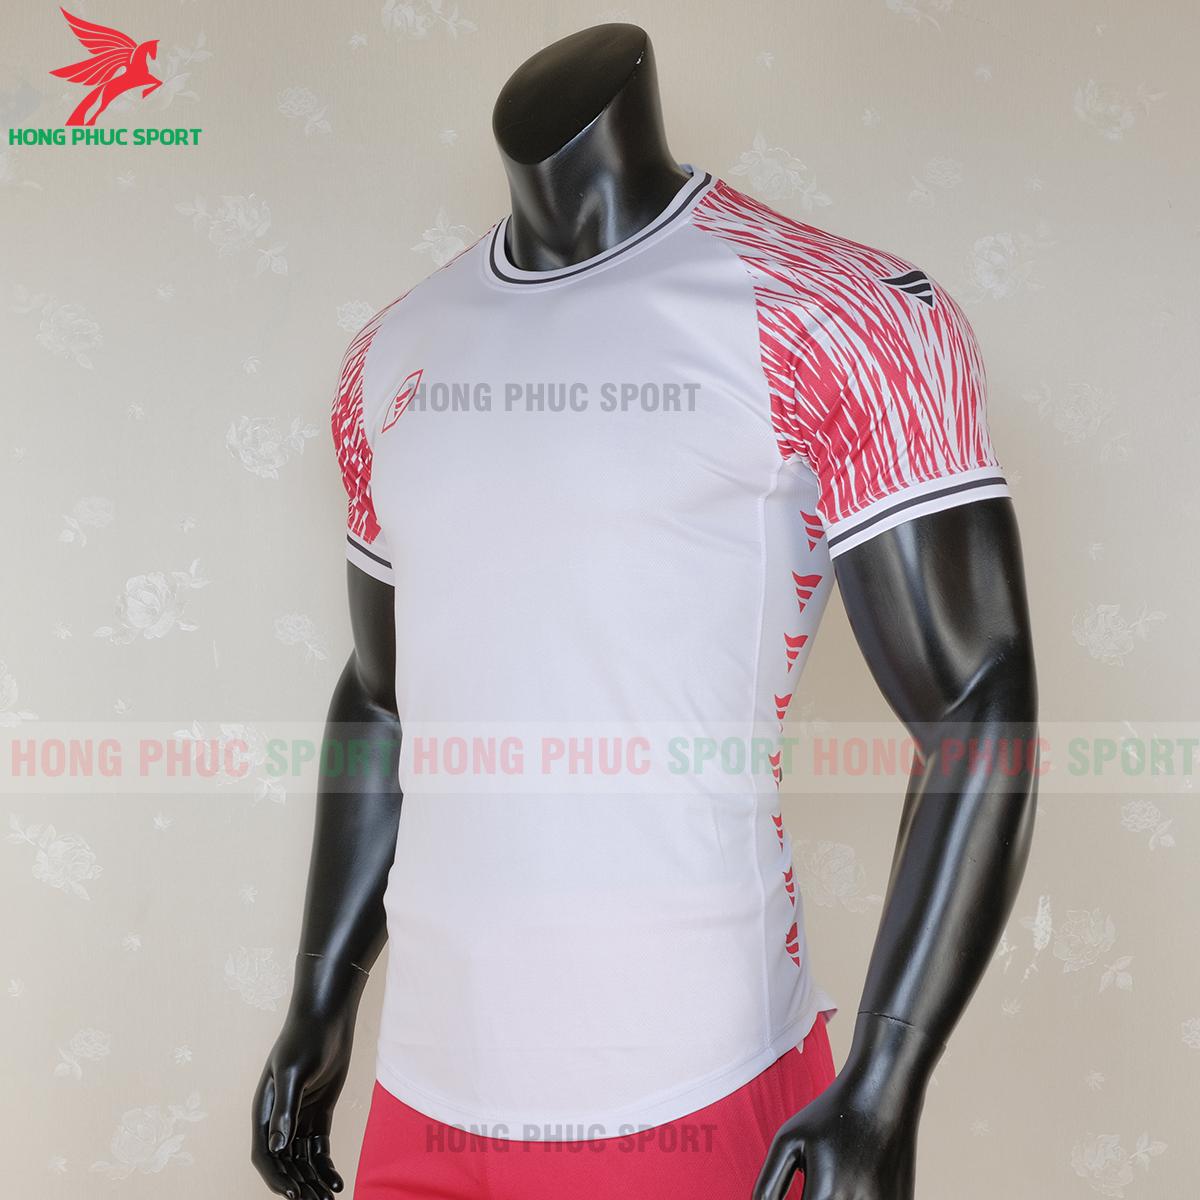 https://cdn.hongphucsport.com/unsafe/s4.shopbay.vn/files/285/ao-bong-da-khong-logo-ta-a06-mau-3-5-5f728cc3d48a4.png